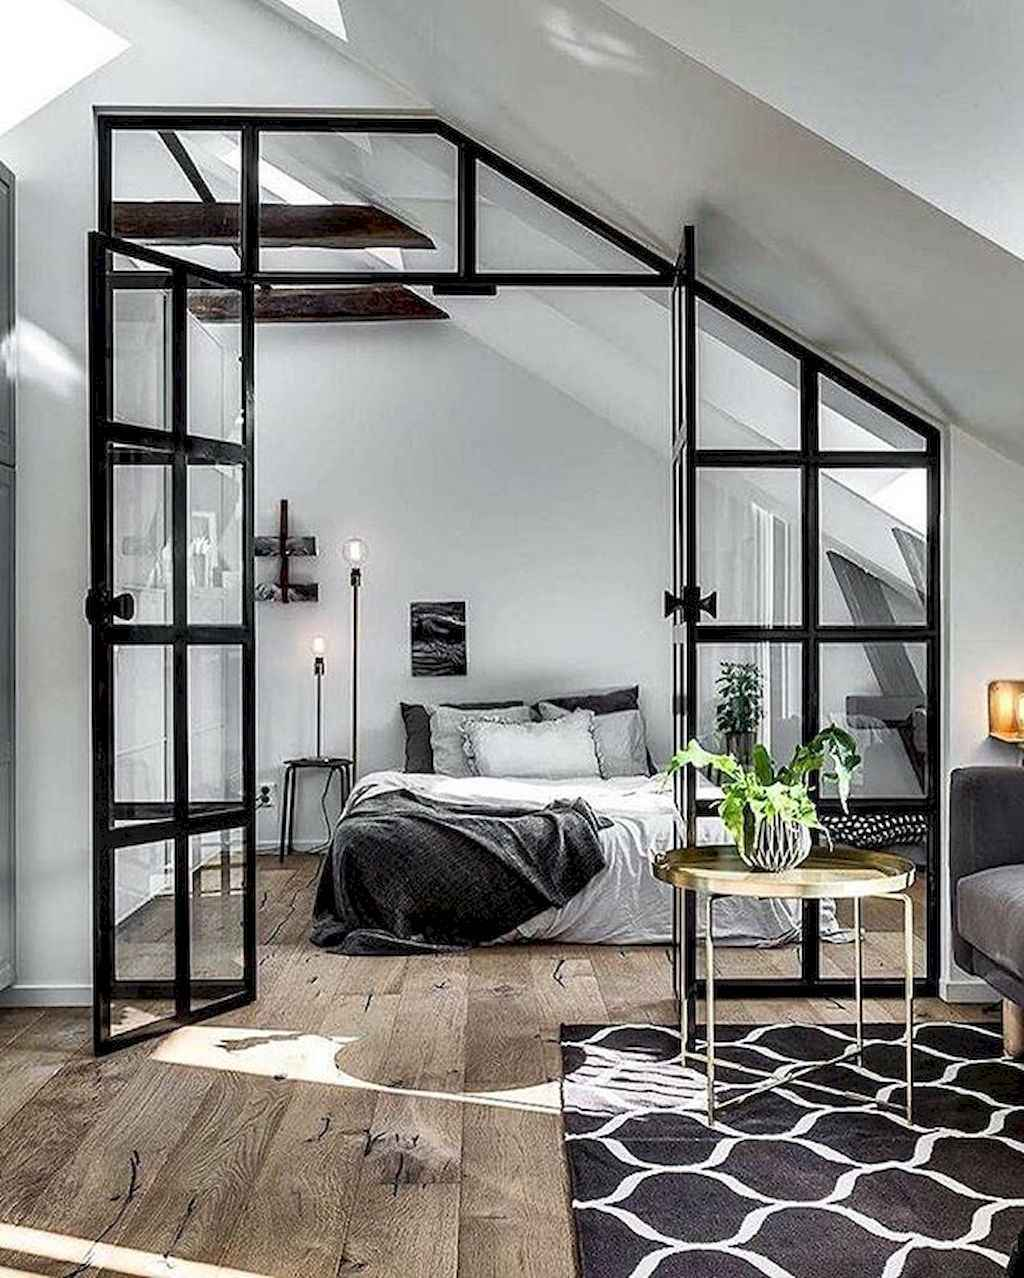 Home Design Ideas Cozy: Cozy Attic Loft Bedroom Design & Decor Ideas (32